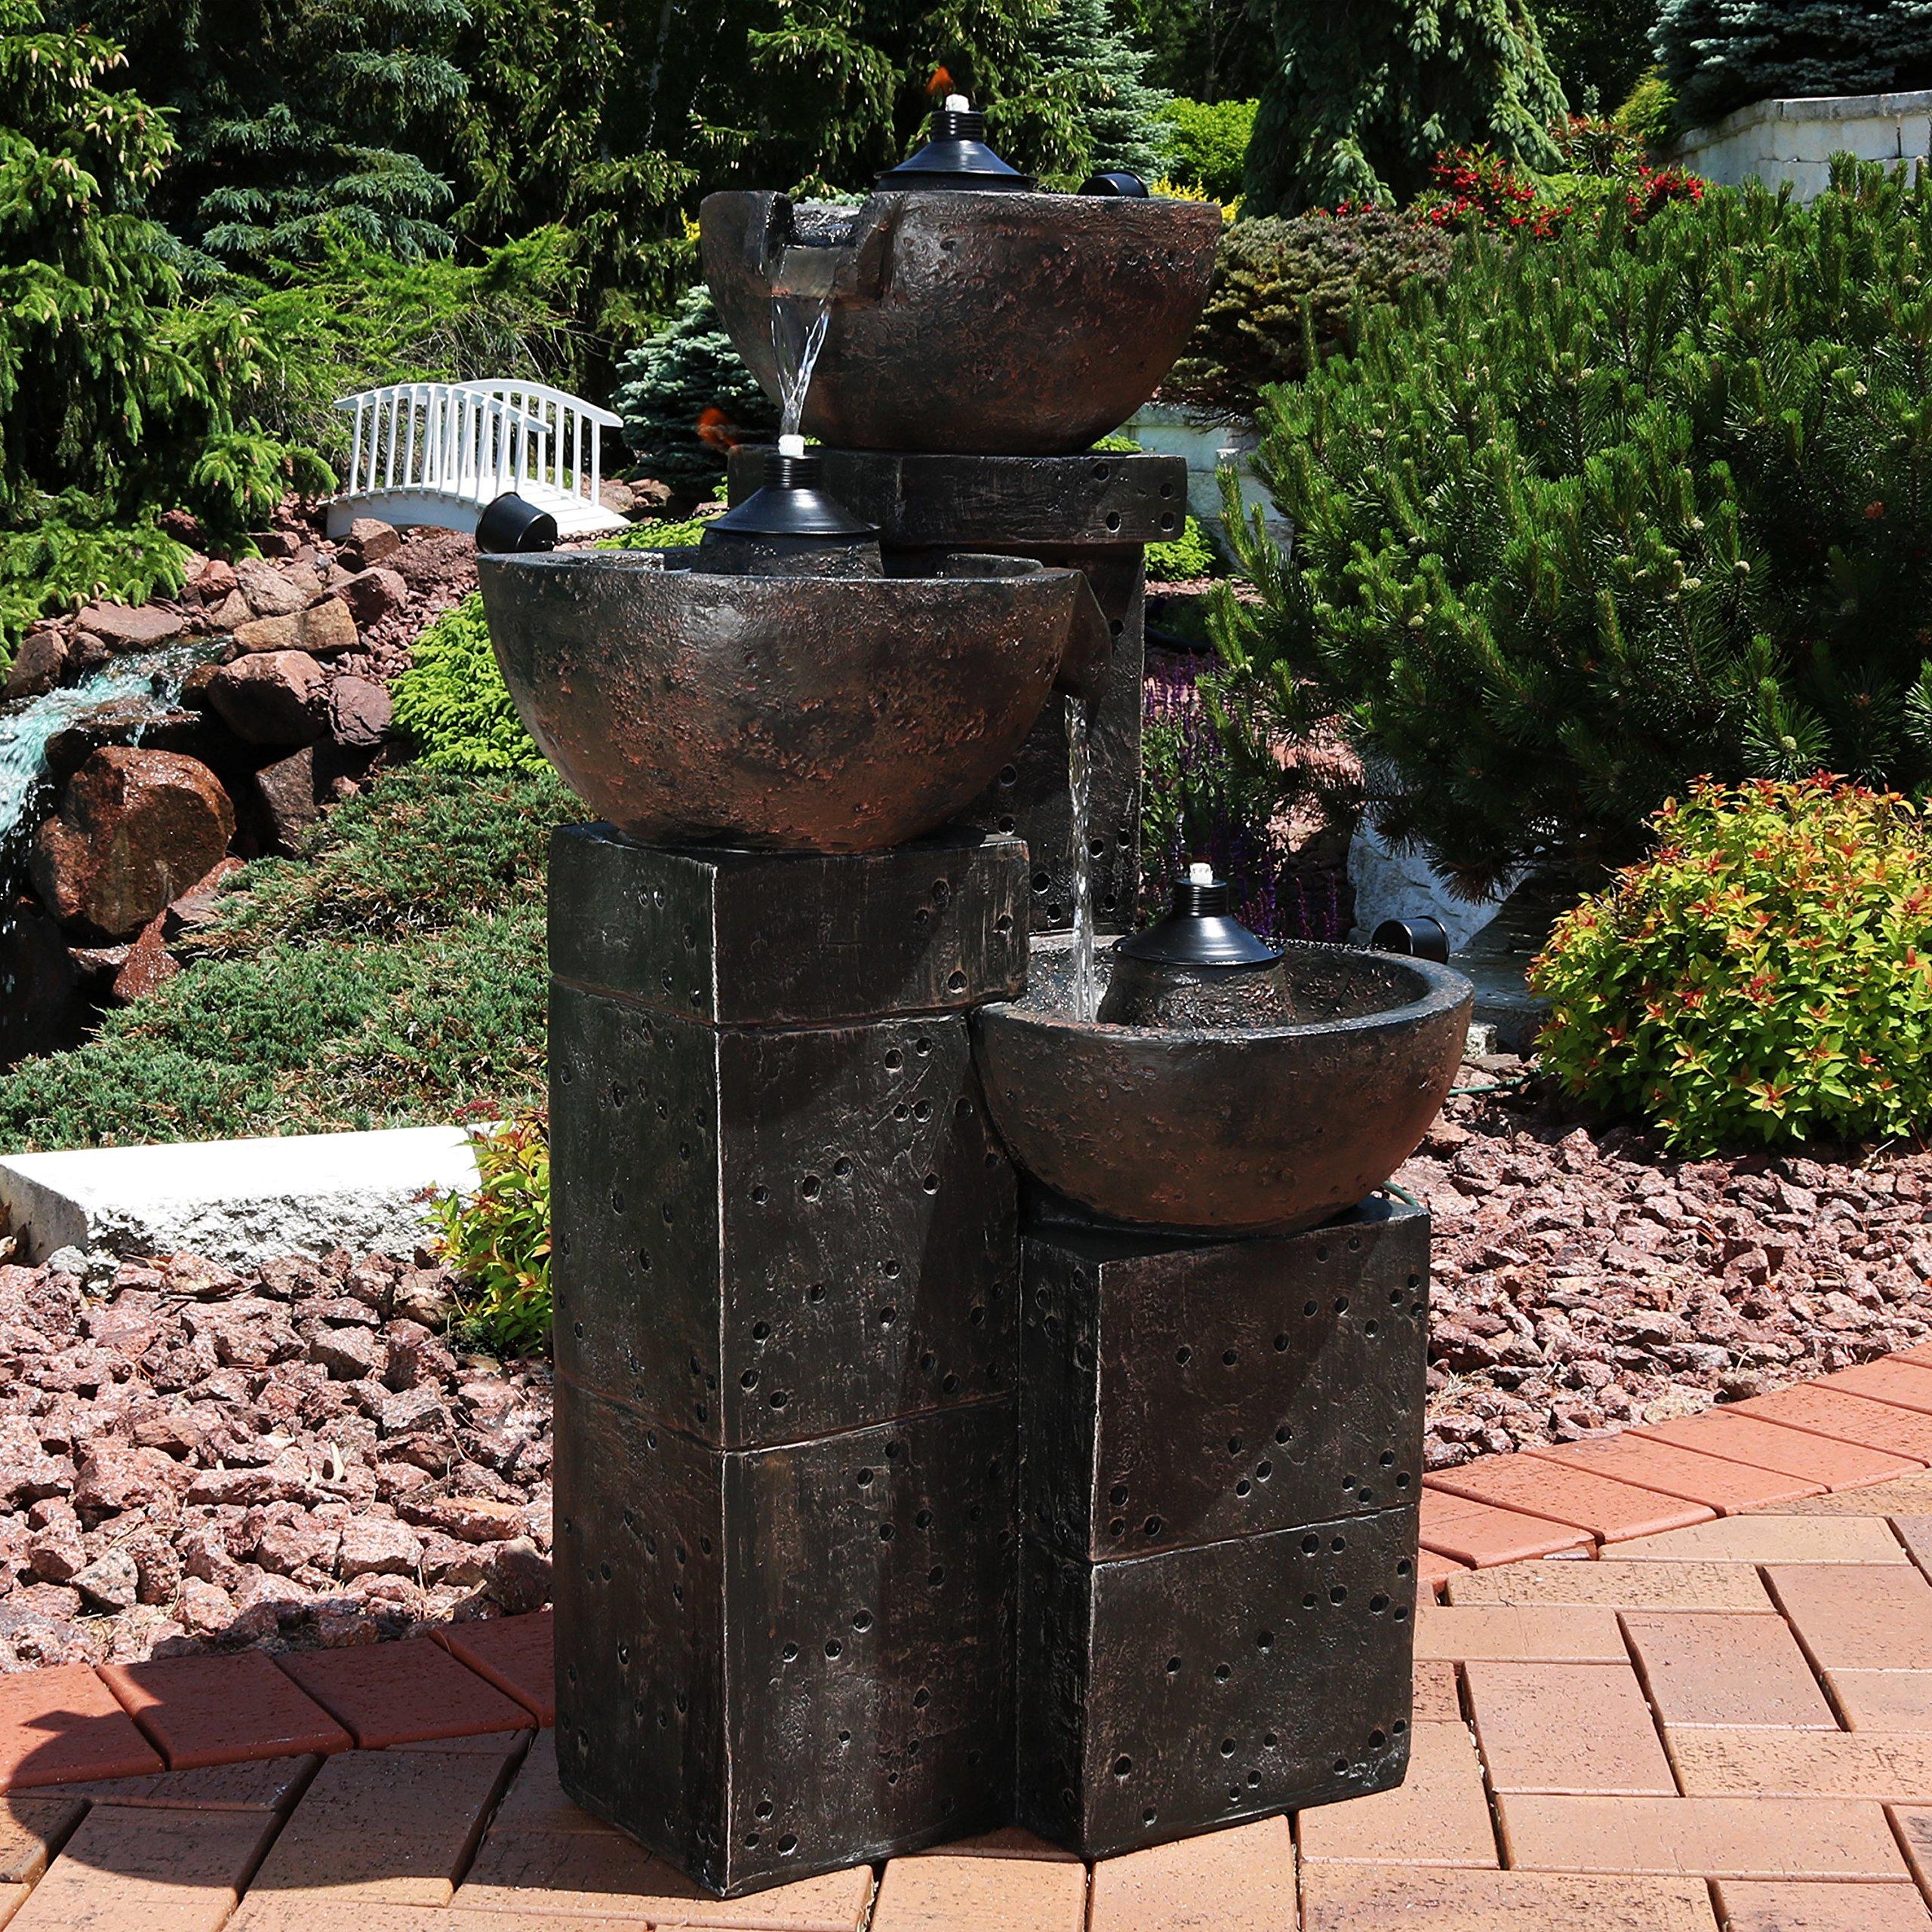 Sunnydaze Burning Bowls Outdoor Water Fountain - 3-Tier ...